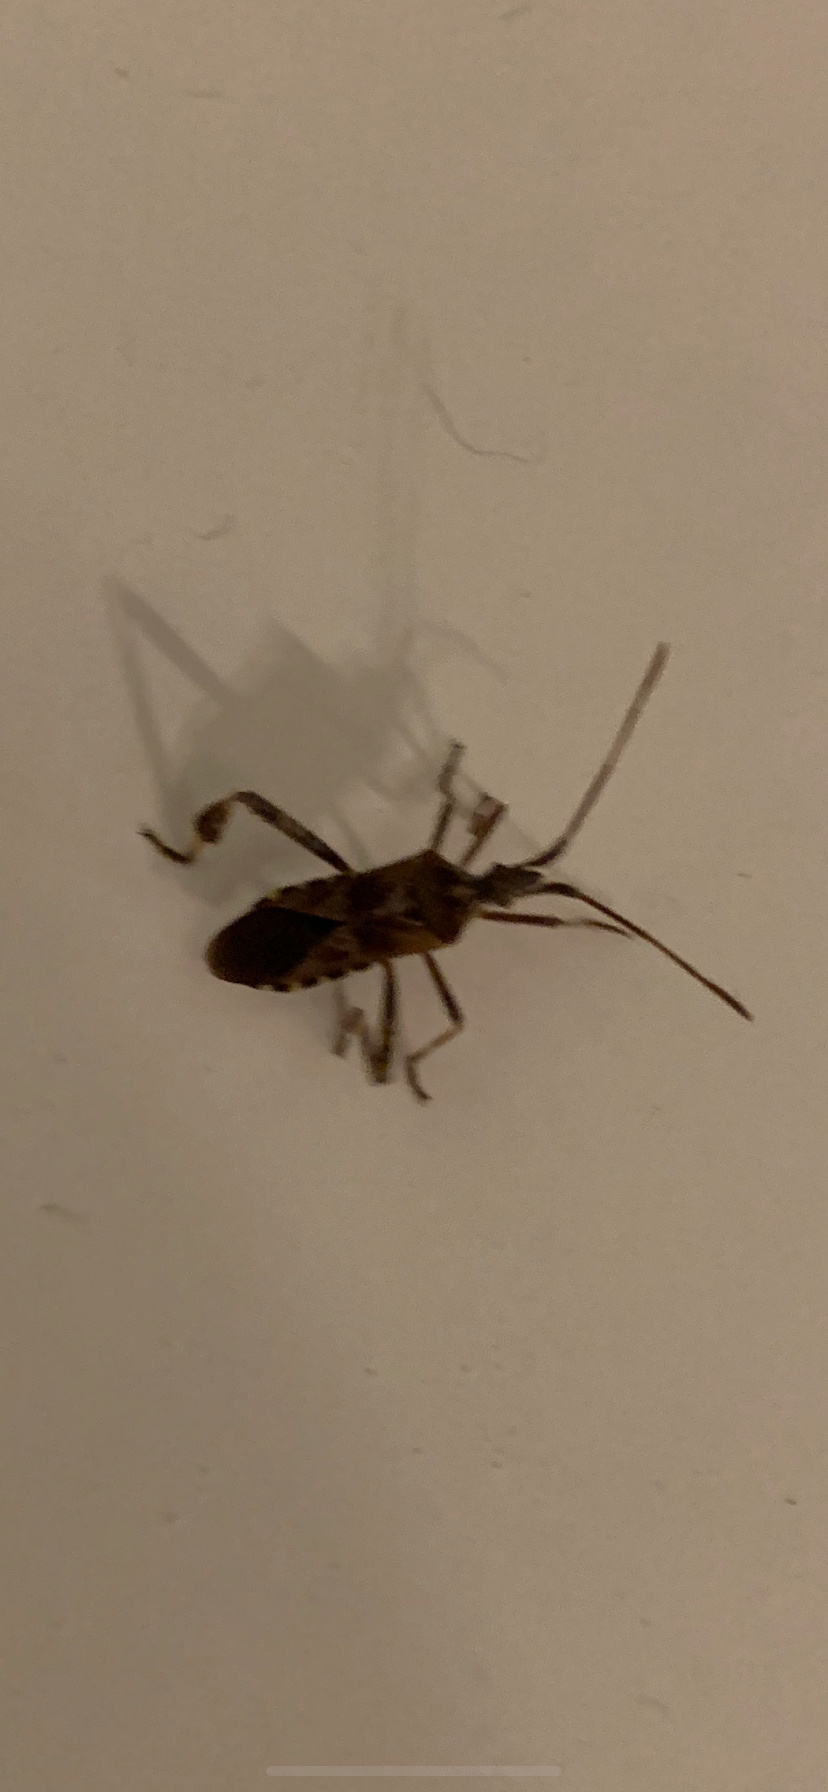 [Leptoglossus occidentalis] Recherche nom d insecte  15ad5910